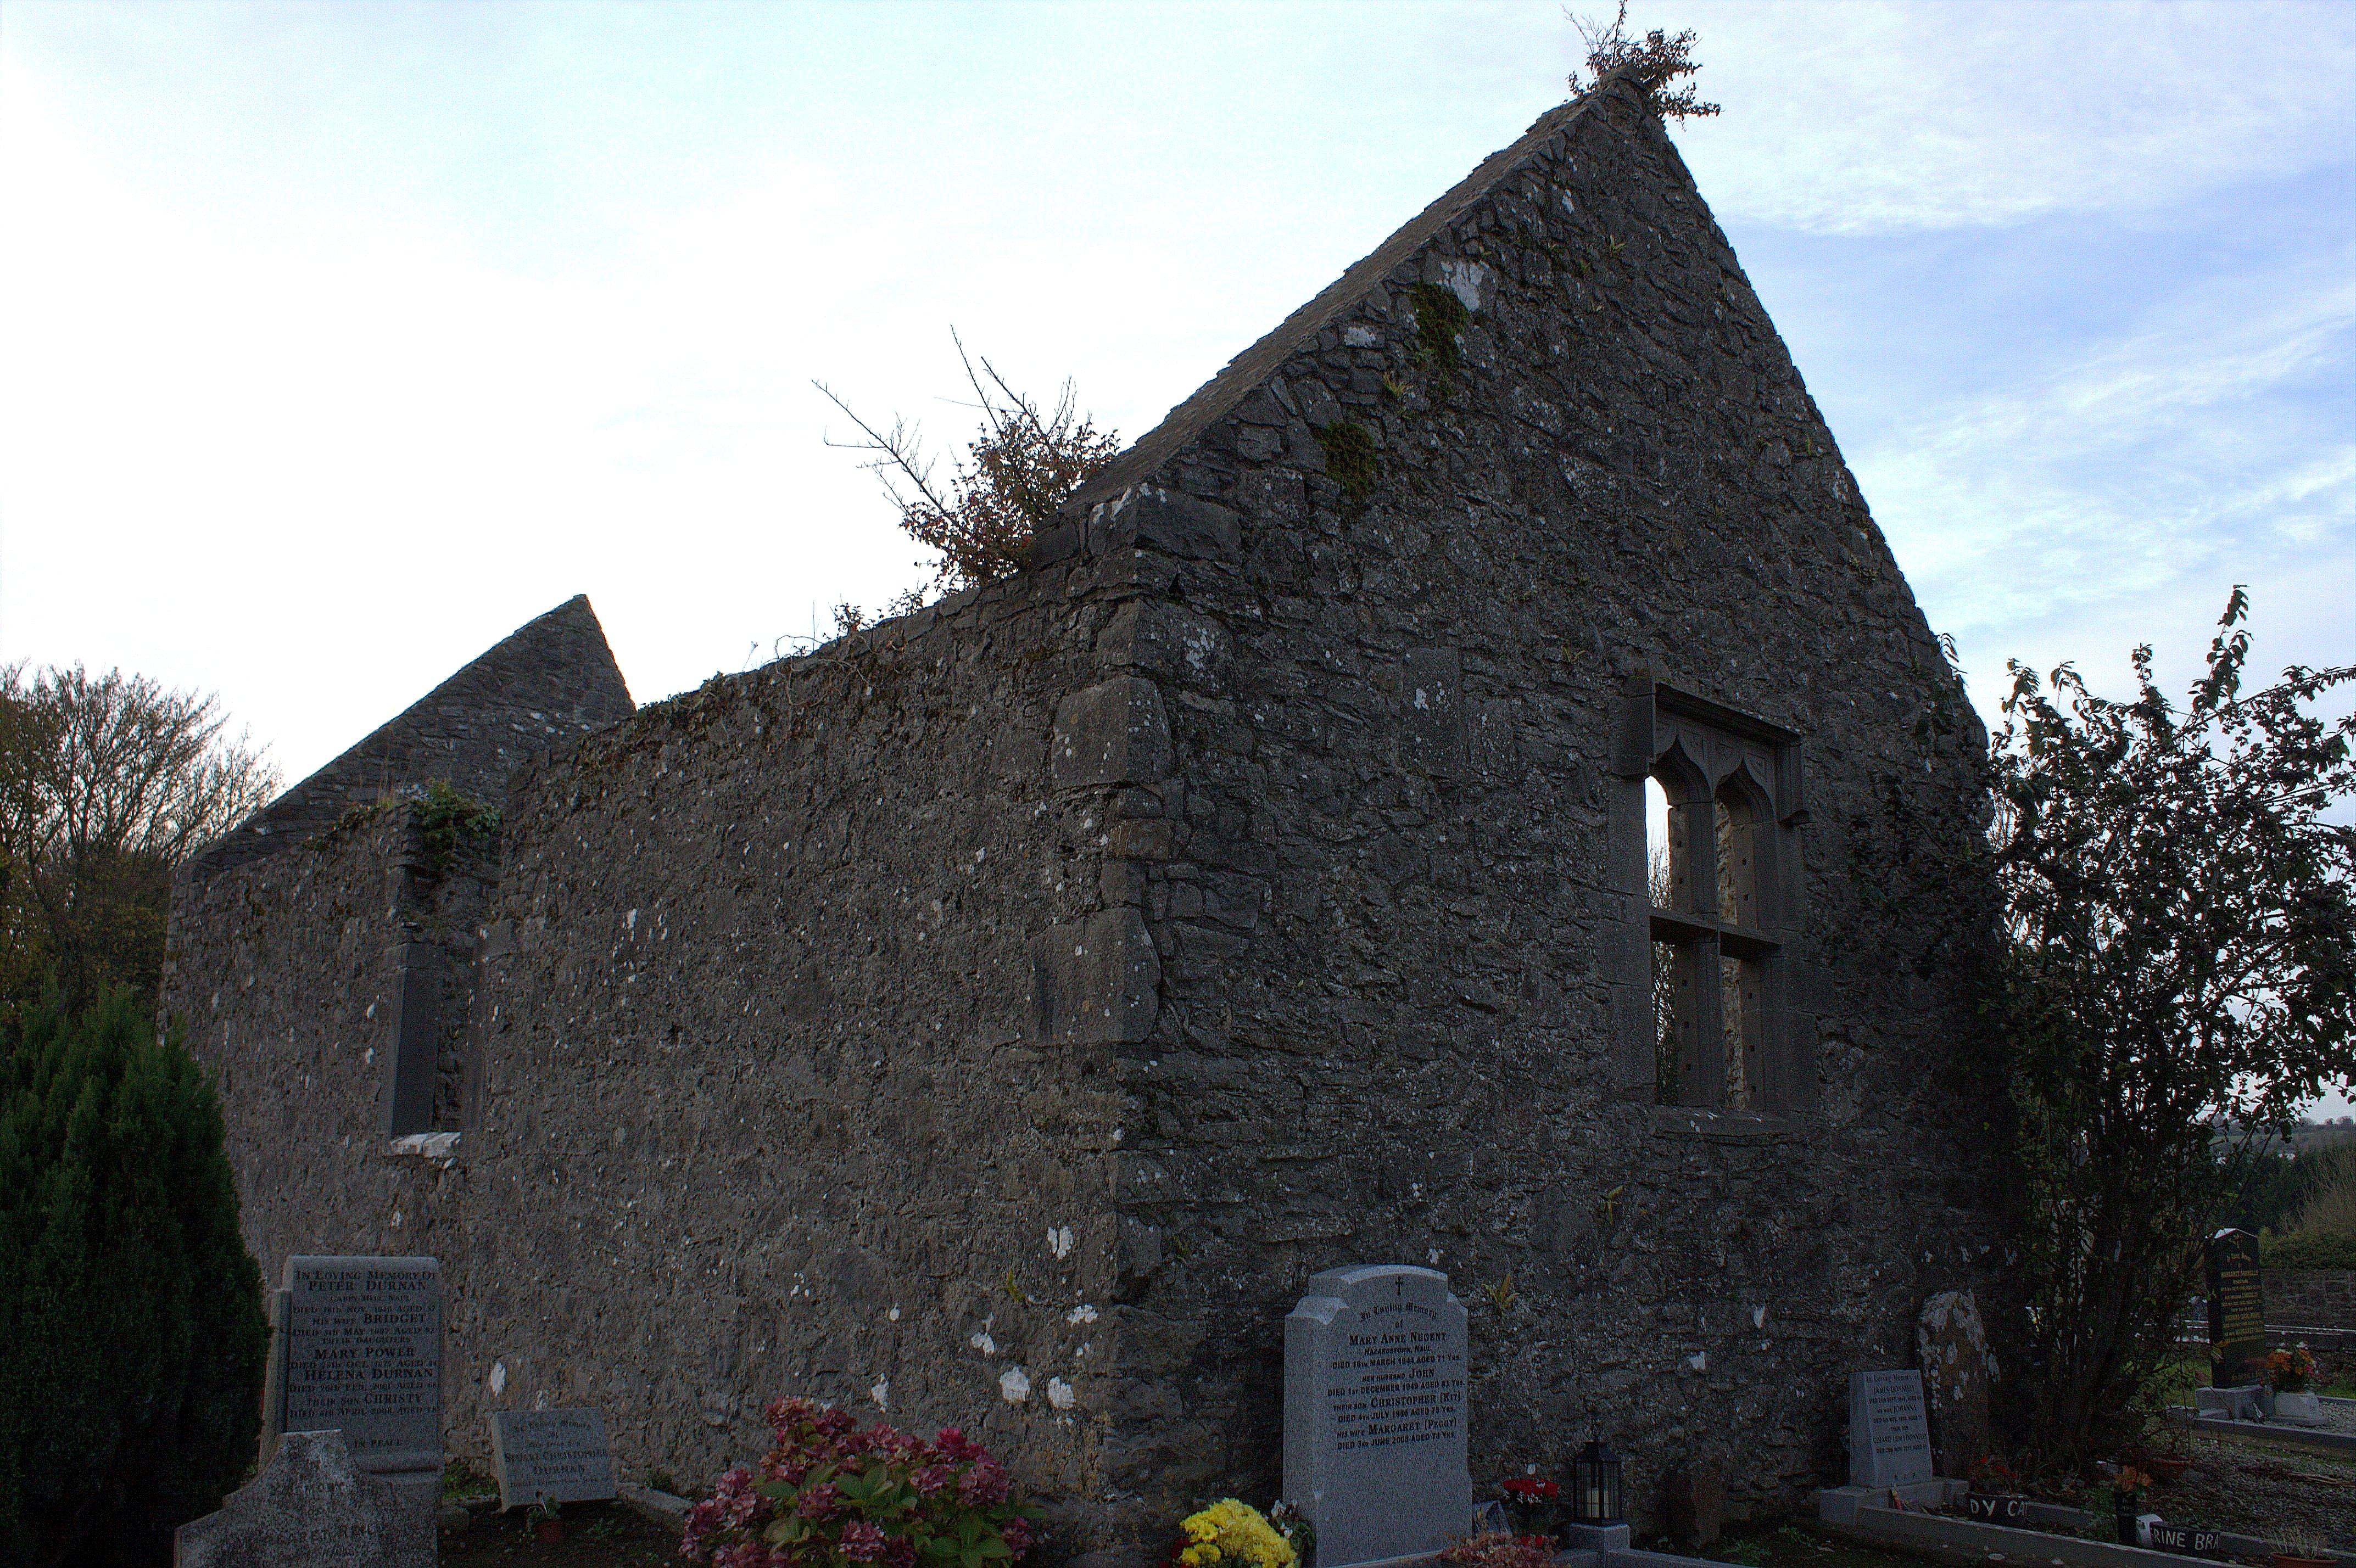 06. Old Naul Parish Church, Dublin, Ireland